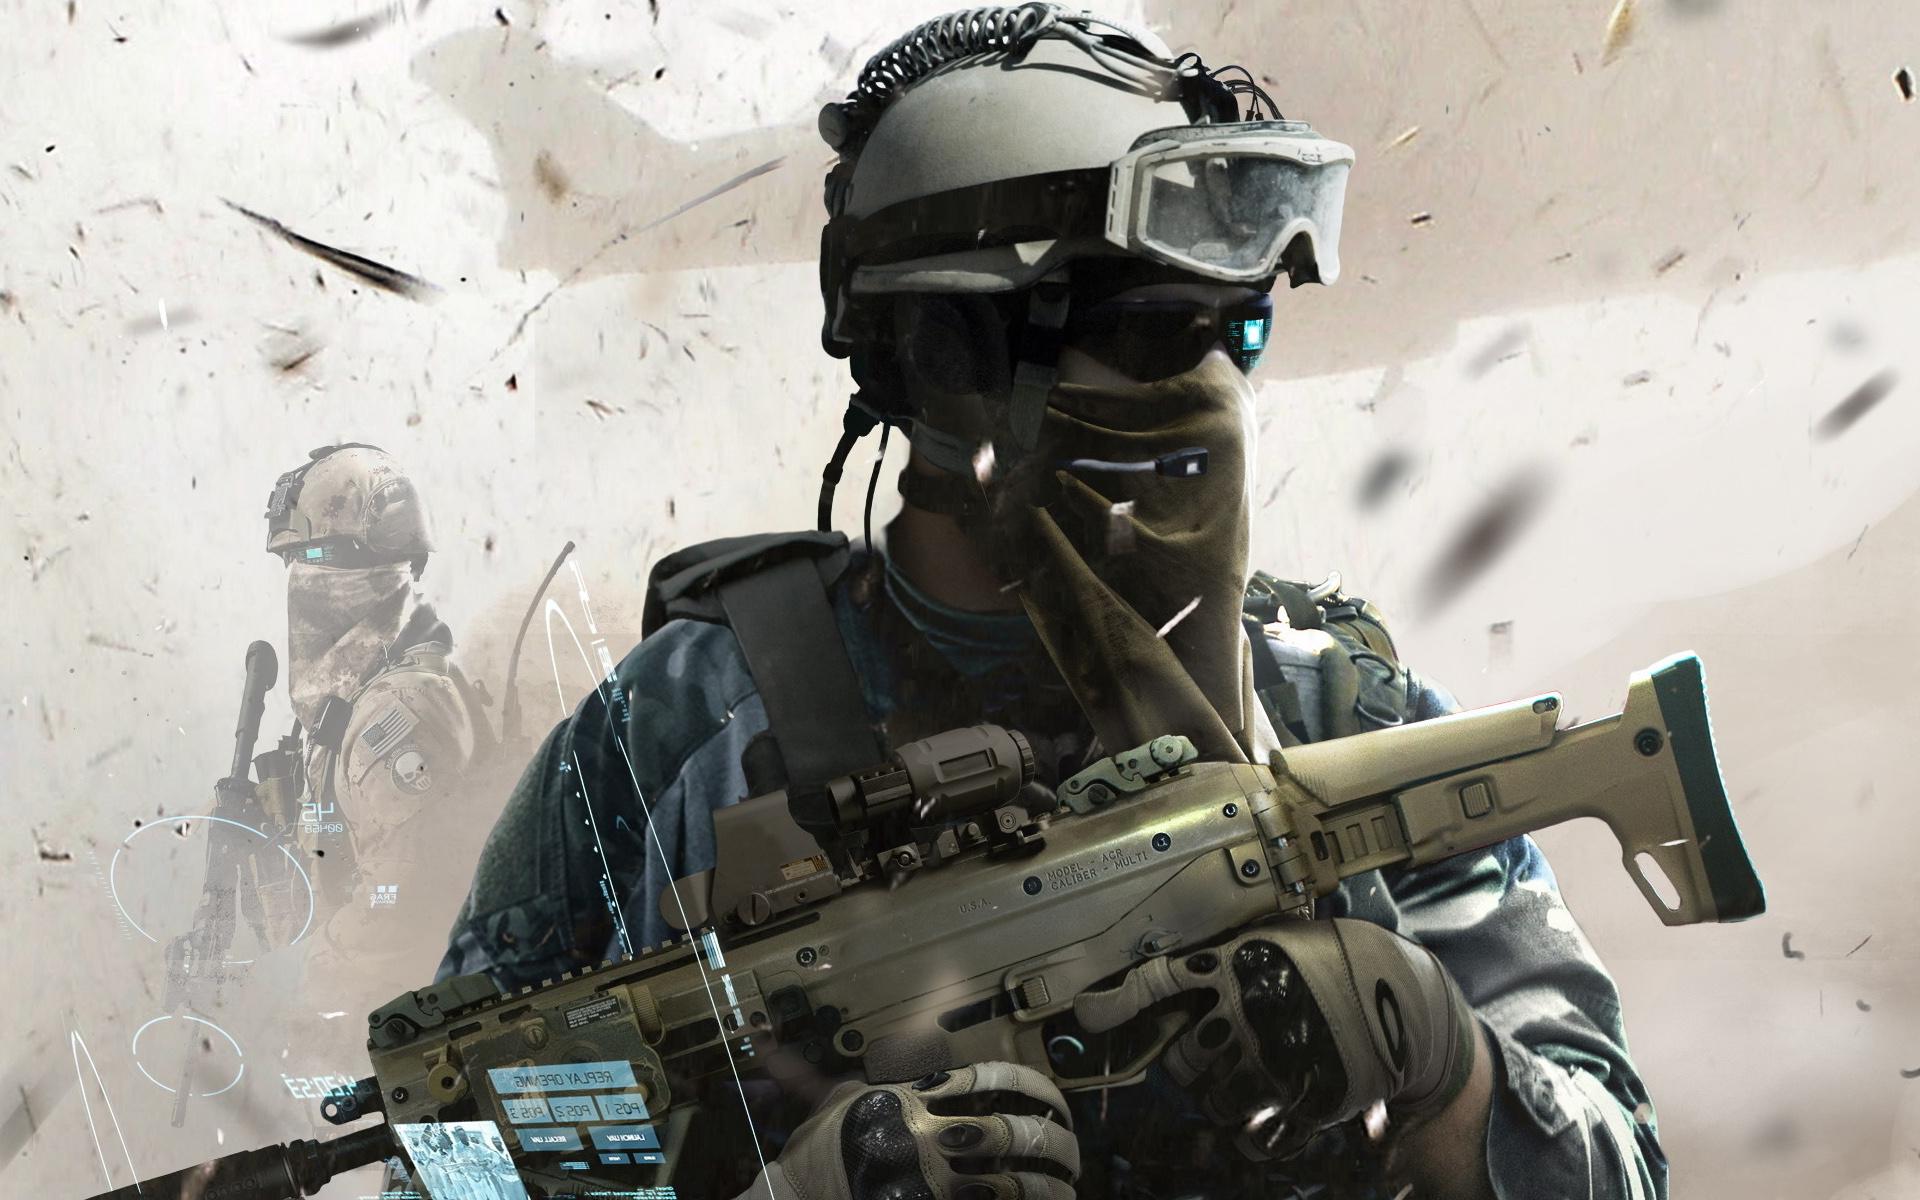 Ghost Recon Future Soldier 13985 1920x1200 Px